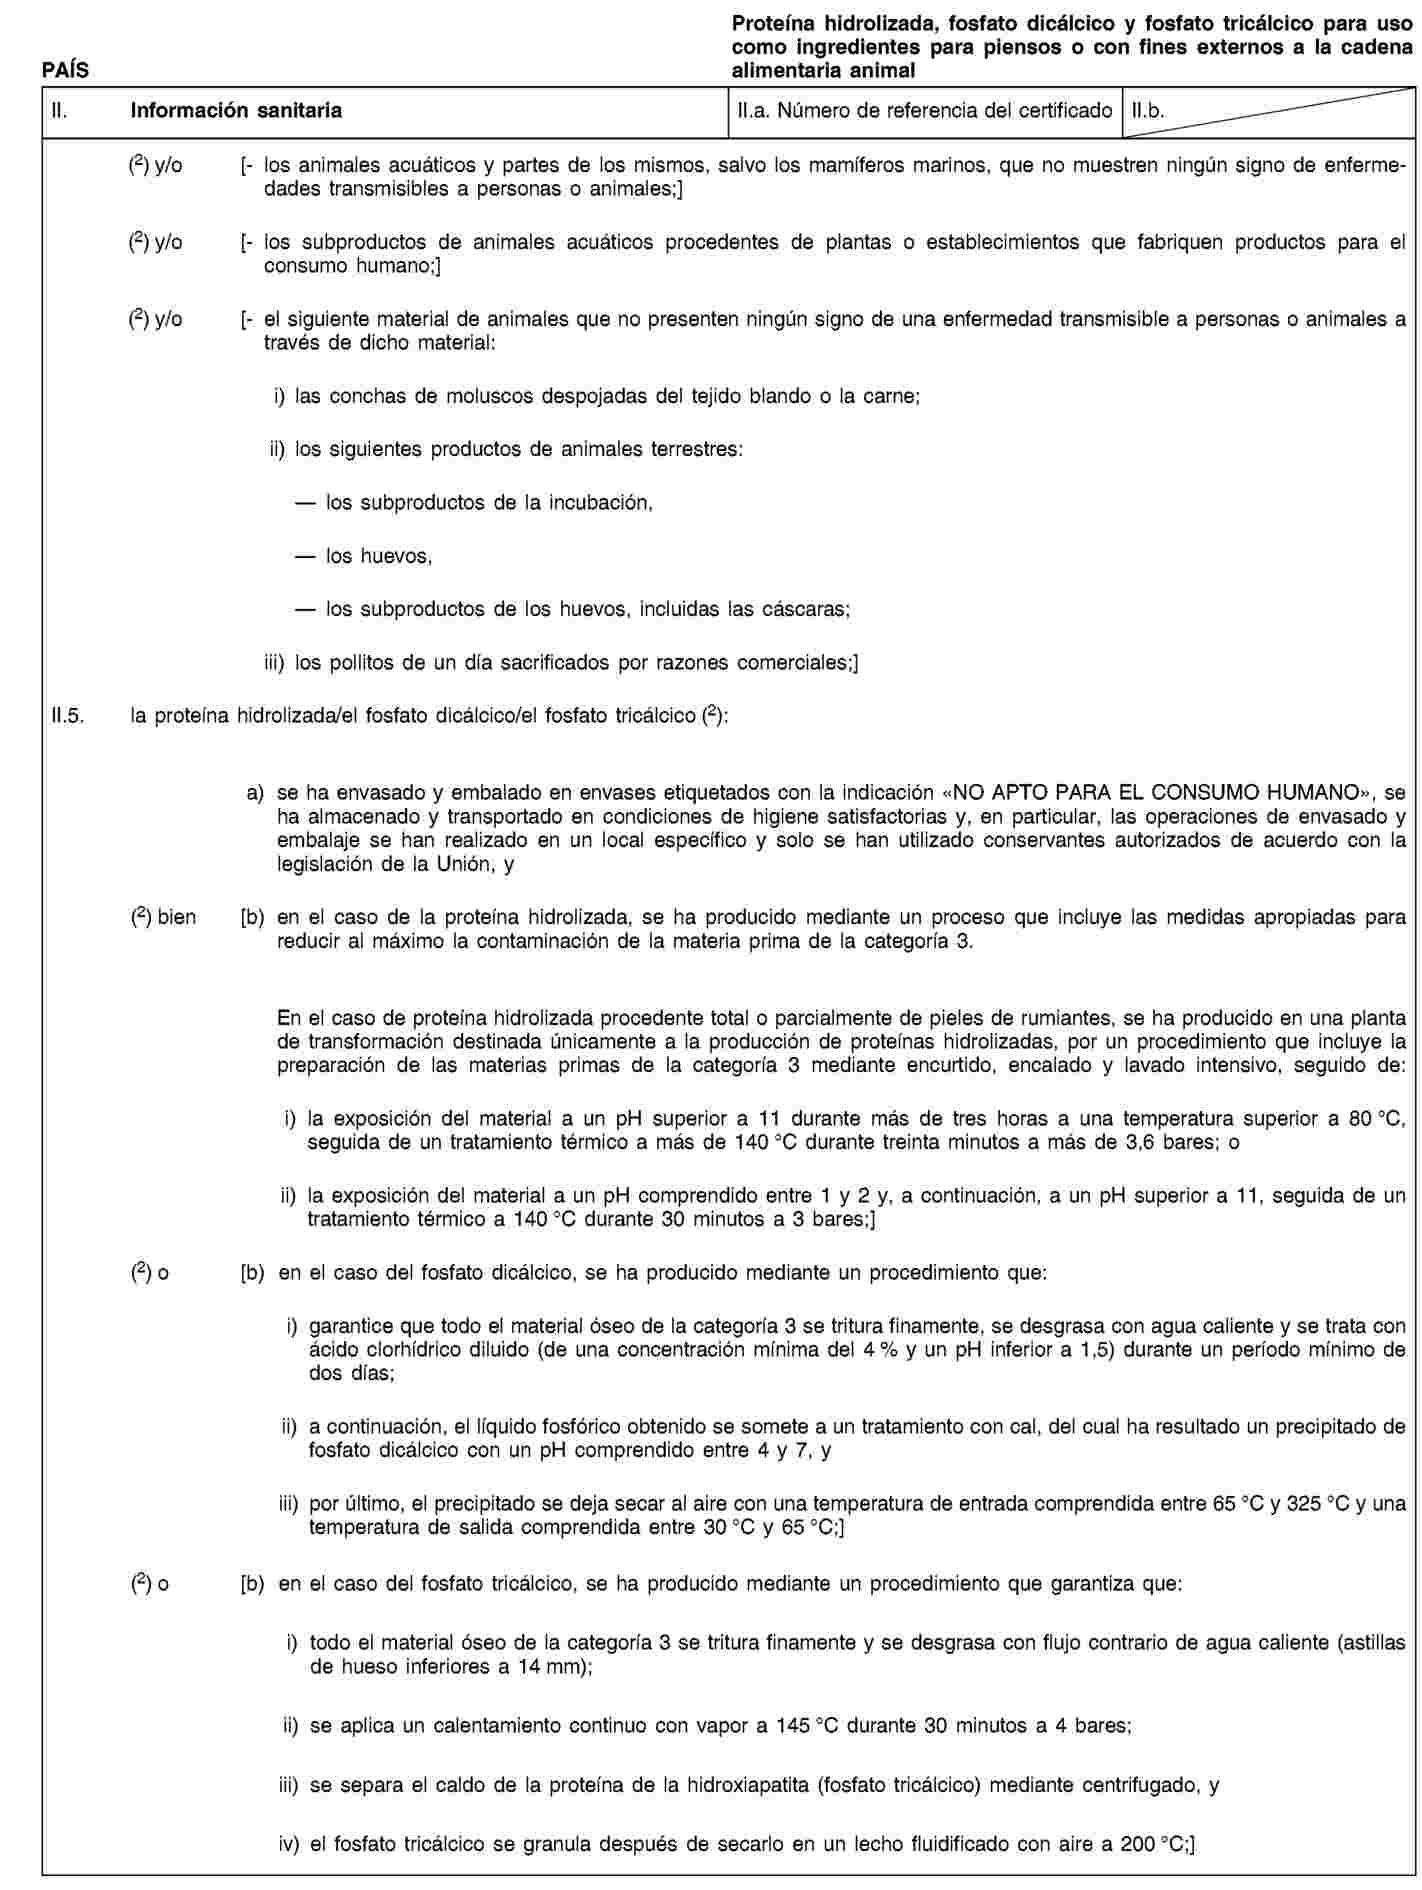 Imagen: https://eur-lex.europa.eu/resource.html?uri=uriserv:OJ.L_.2011.054.01.0001.01.SPA.xhtml.L_2011054ES.01022001.tif.jpg